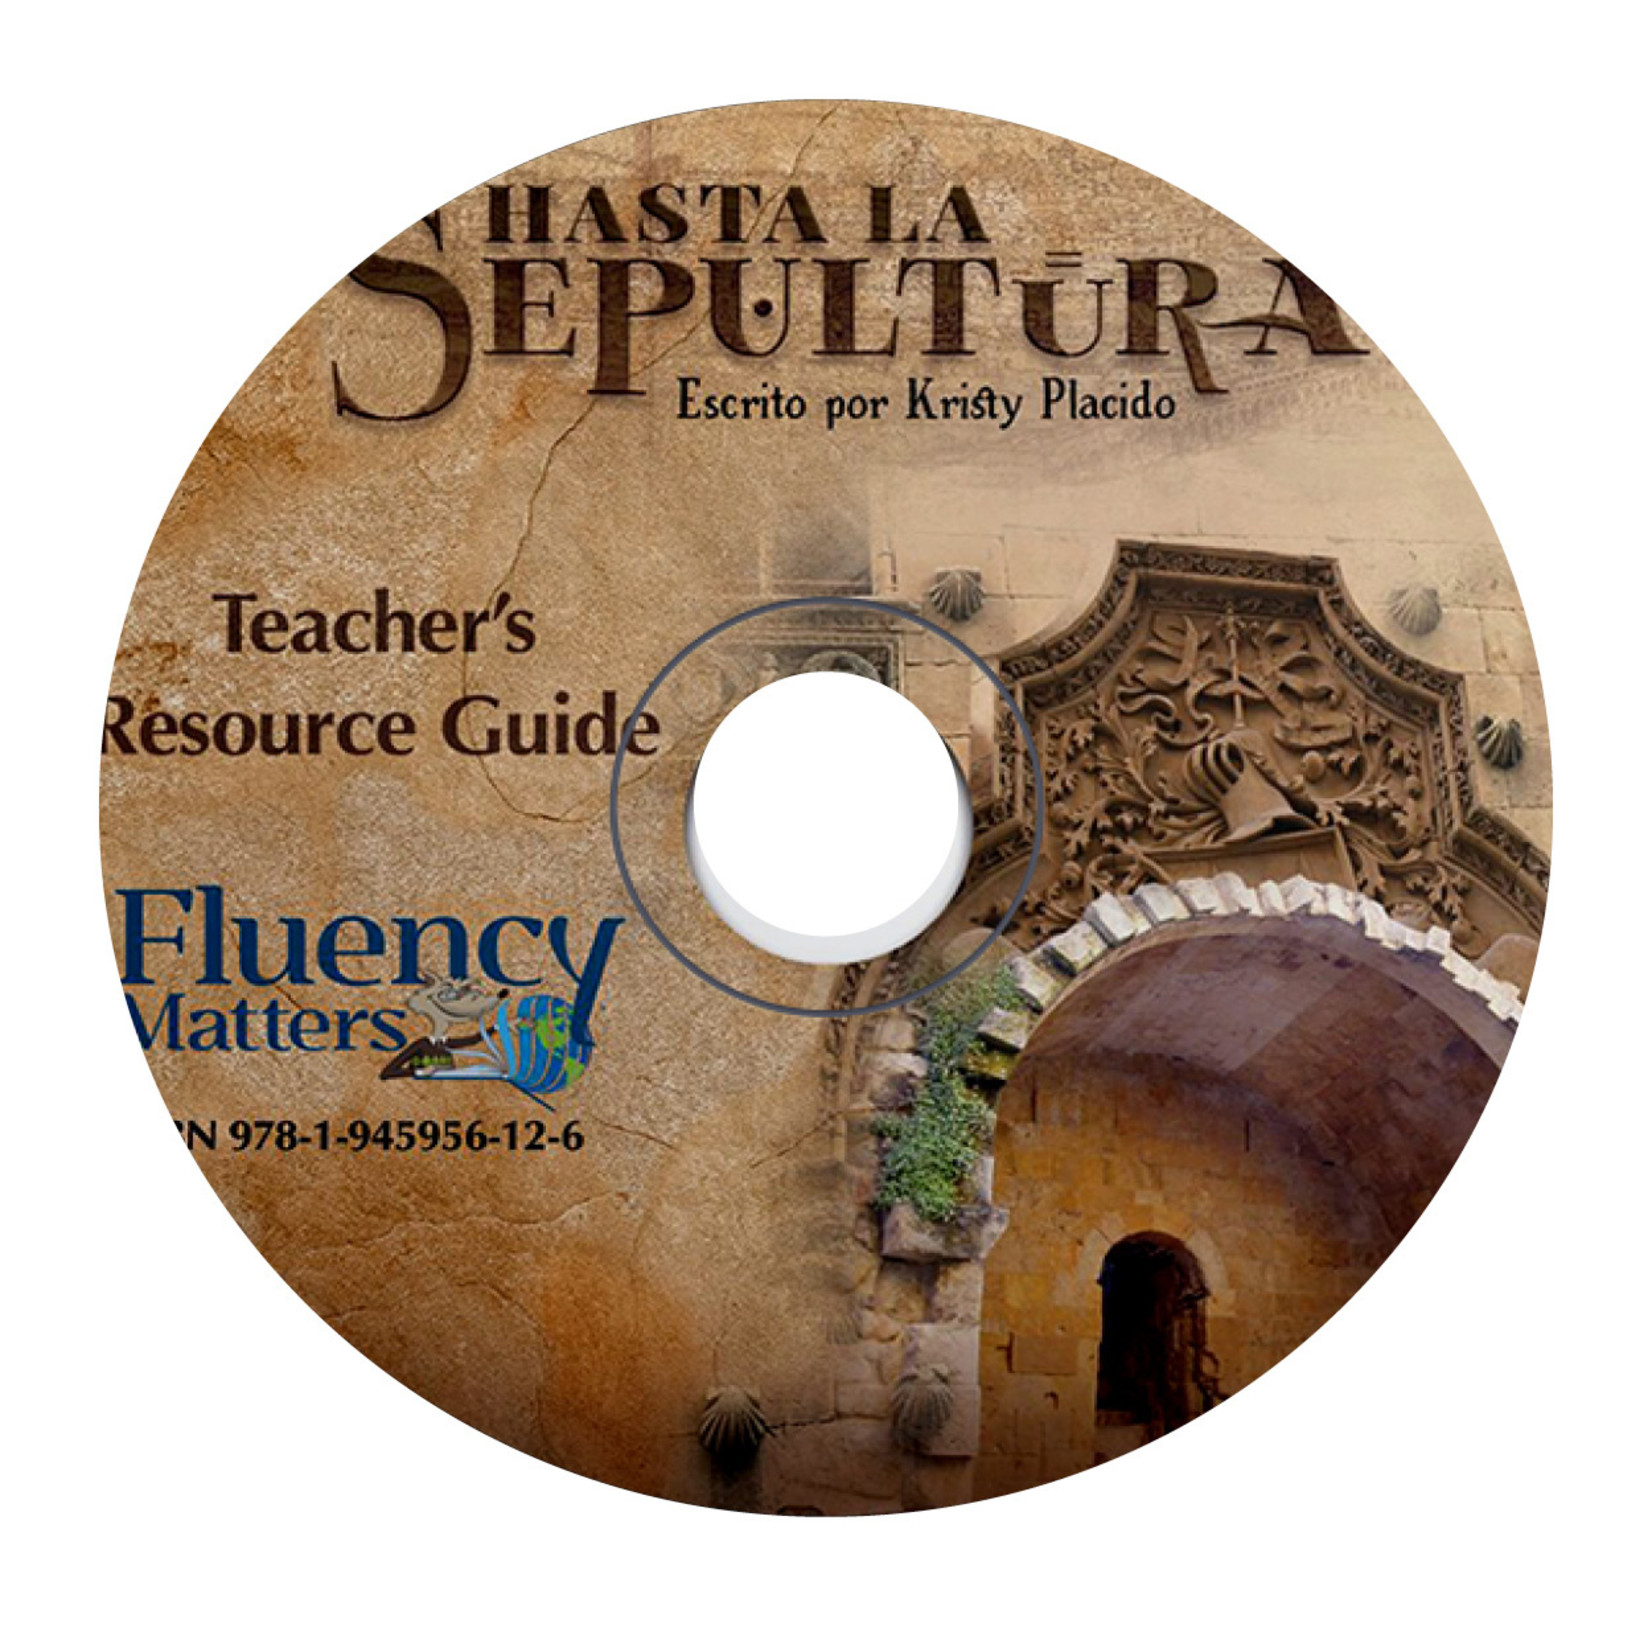 Fluency Matters Hasta la sepultura - Teacher's Guide